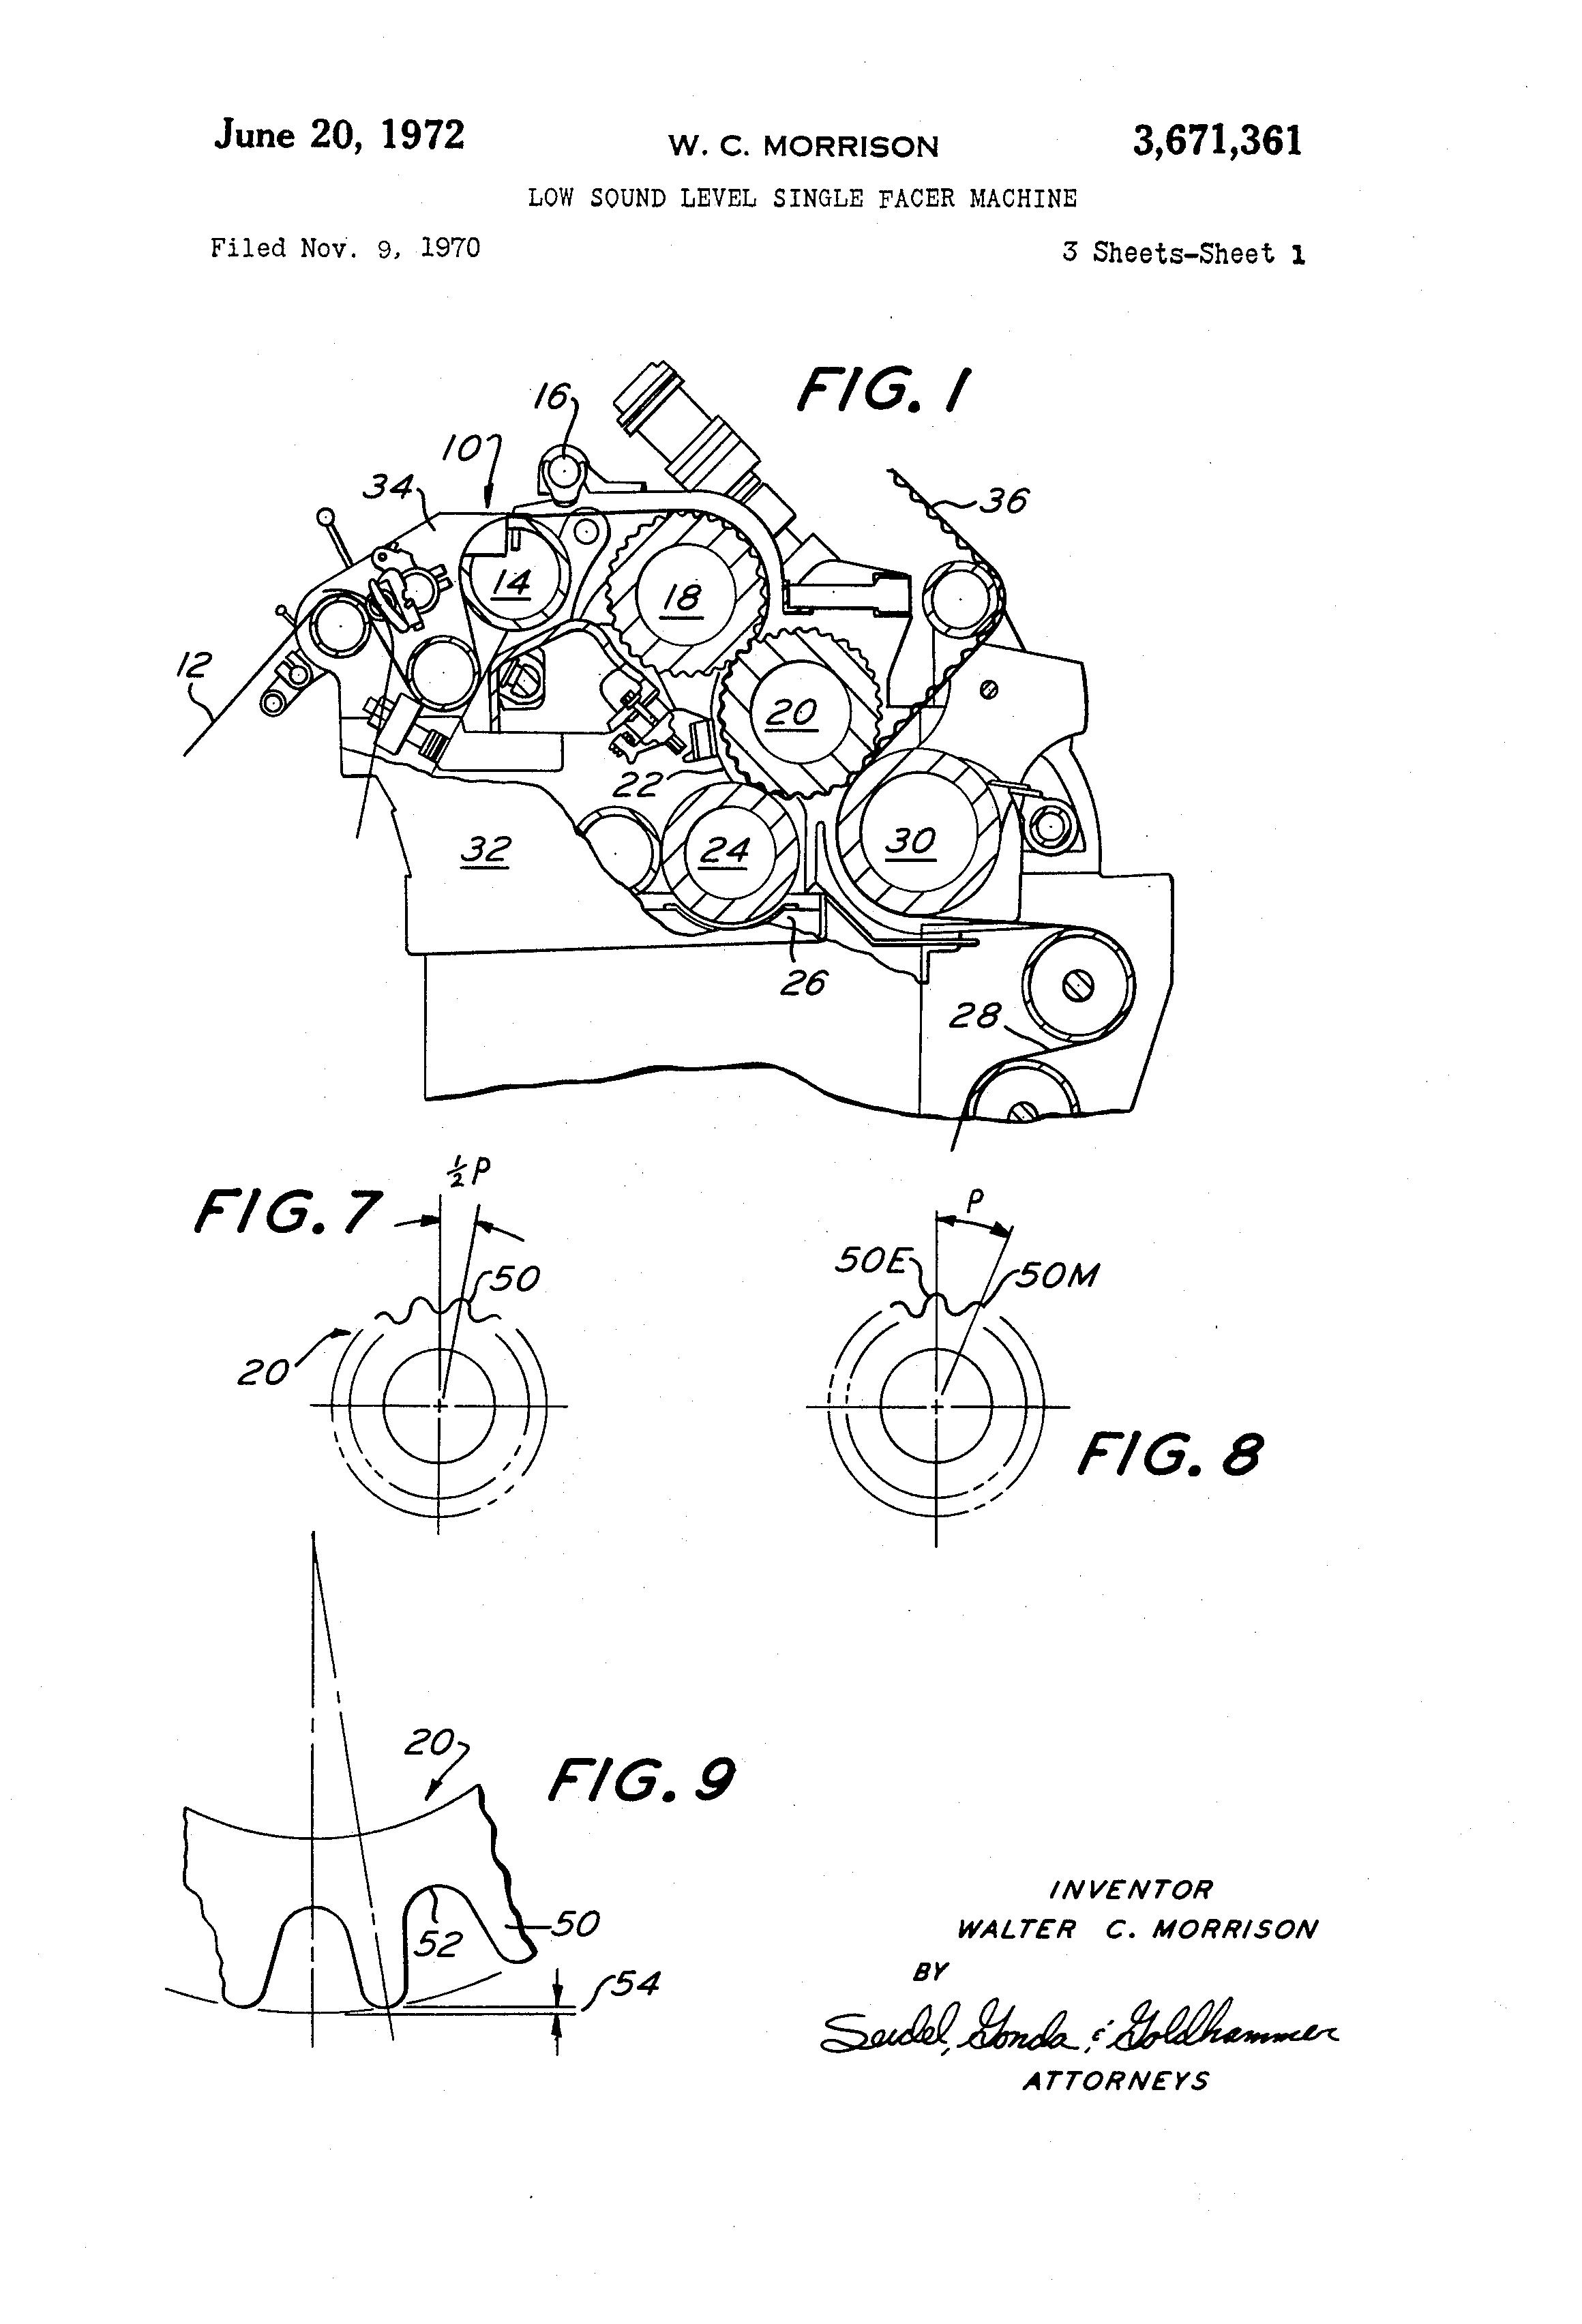 Patent US3671361 - Low sound level single facer machine